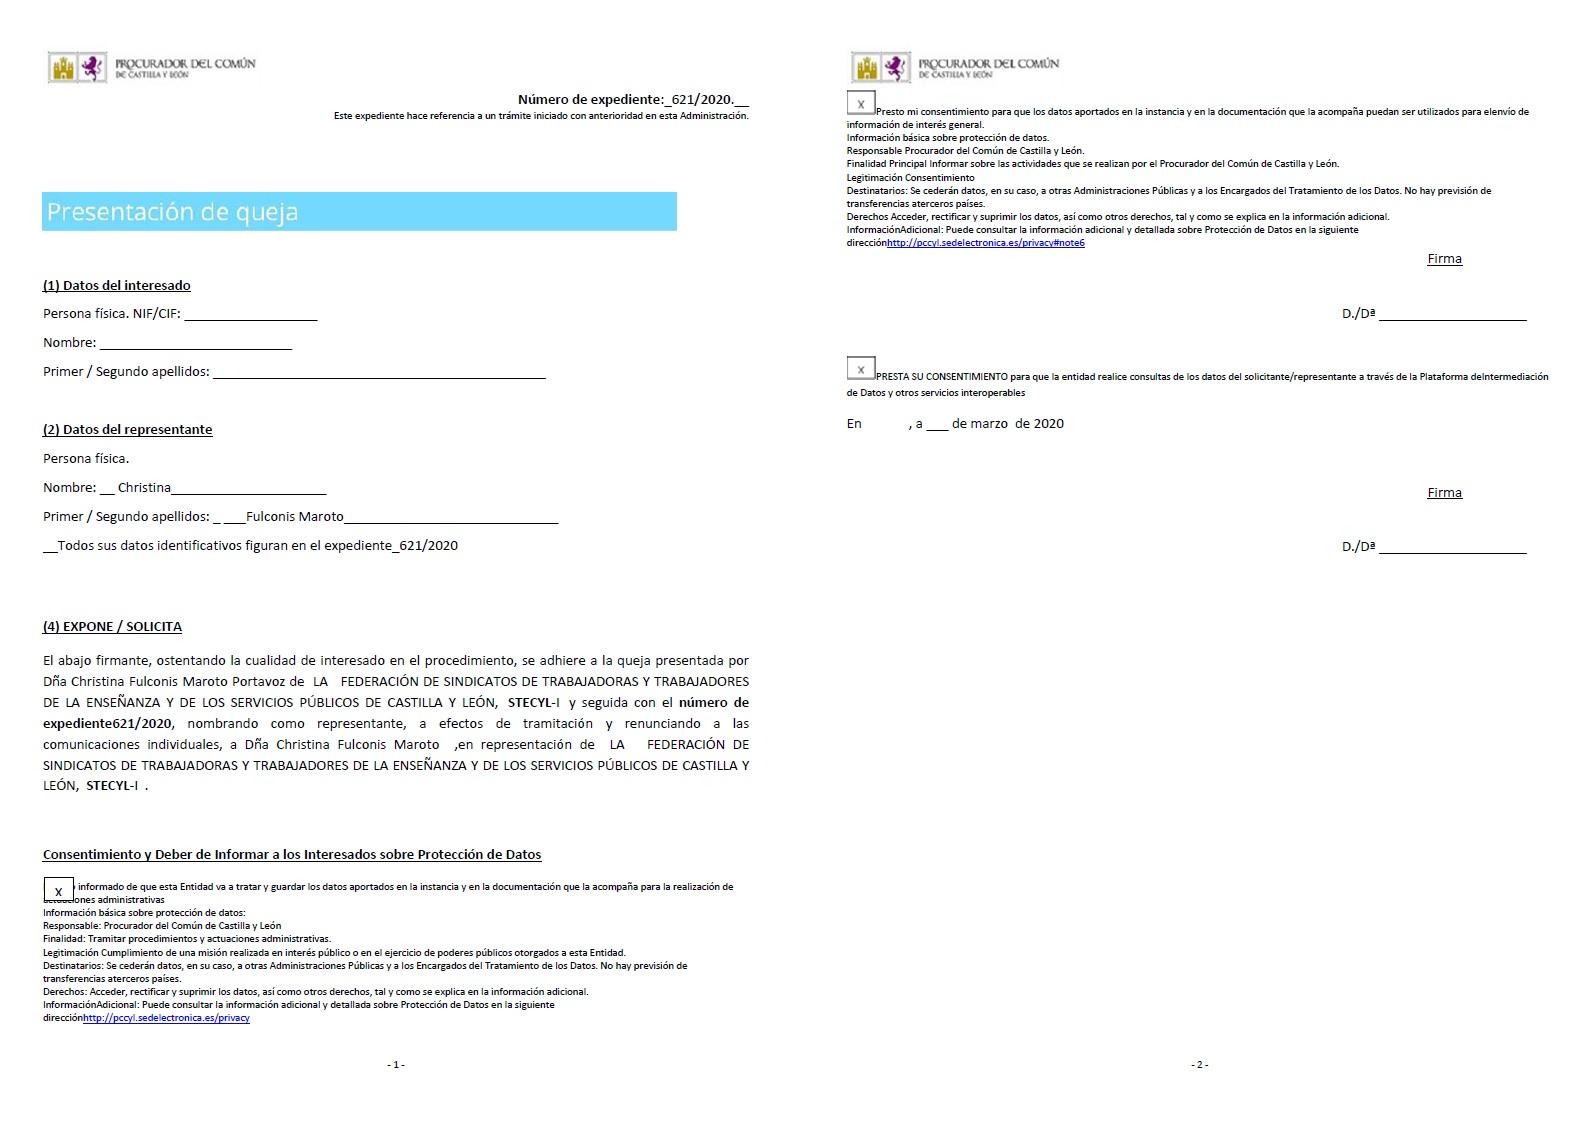 Adhesion-queja-procurador-Comun-621-2020